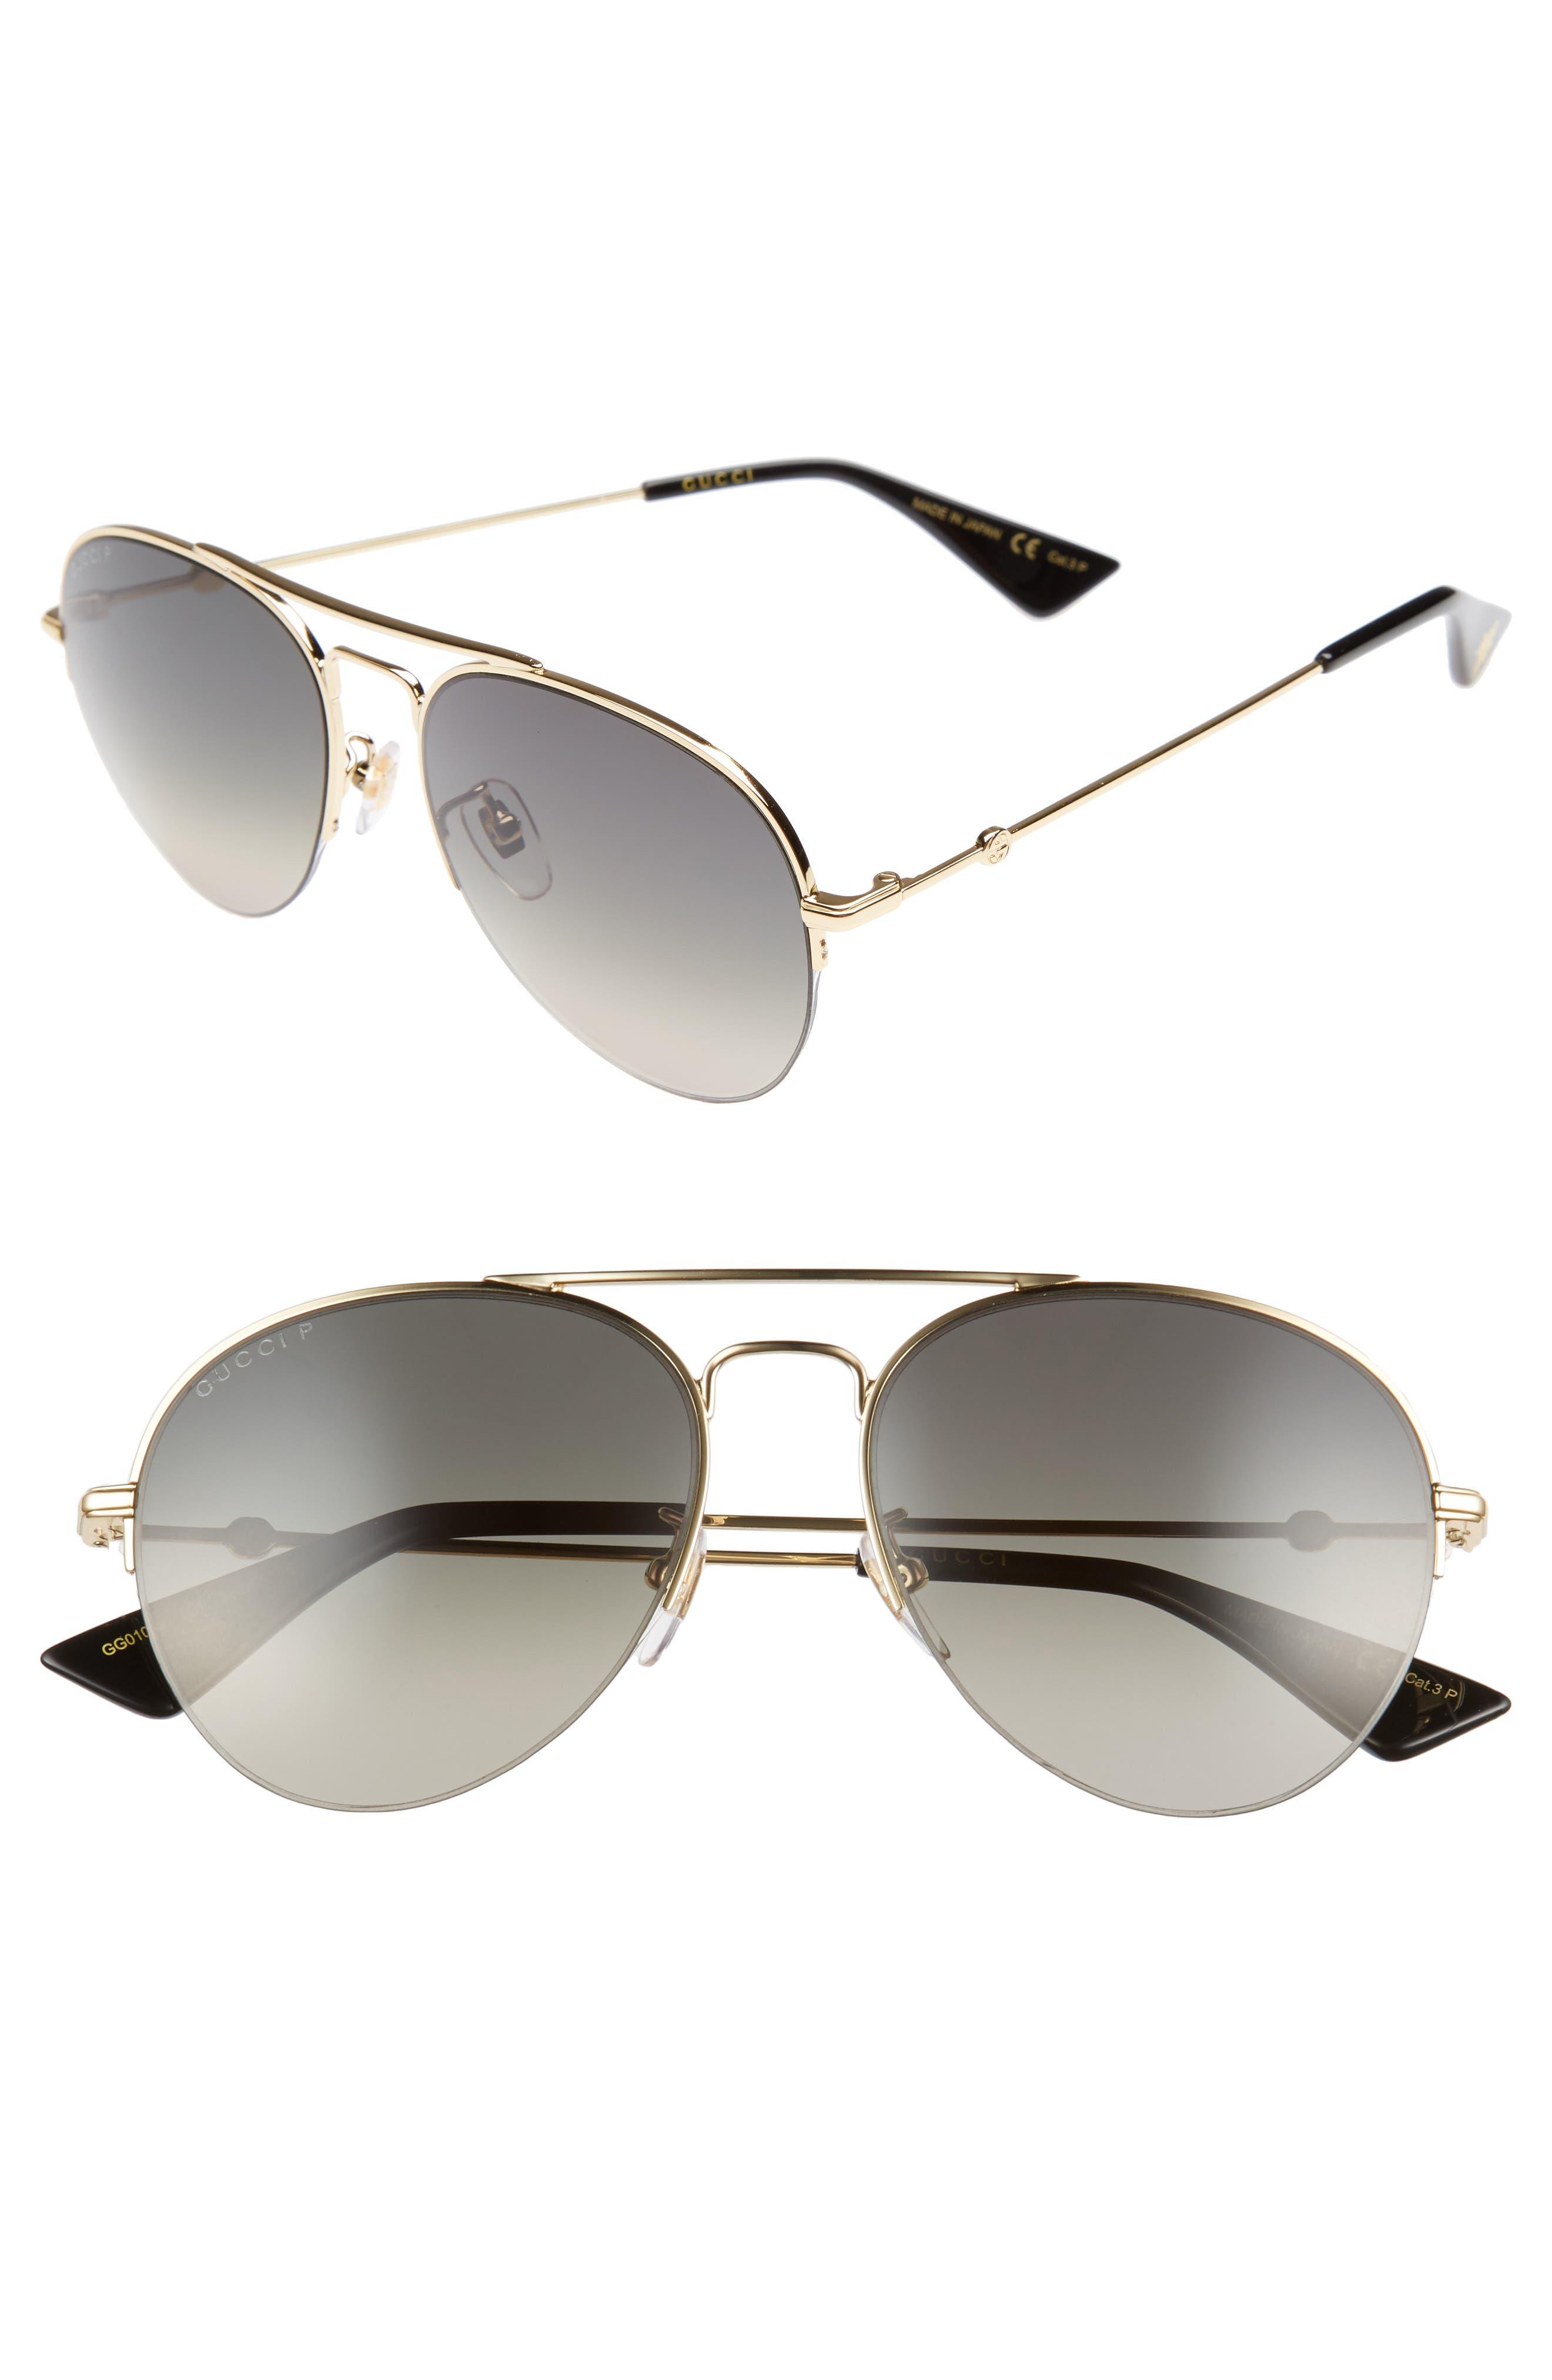 Pilot 56mm Aviator Sunglasses,                         Main,                         color, GOLD